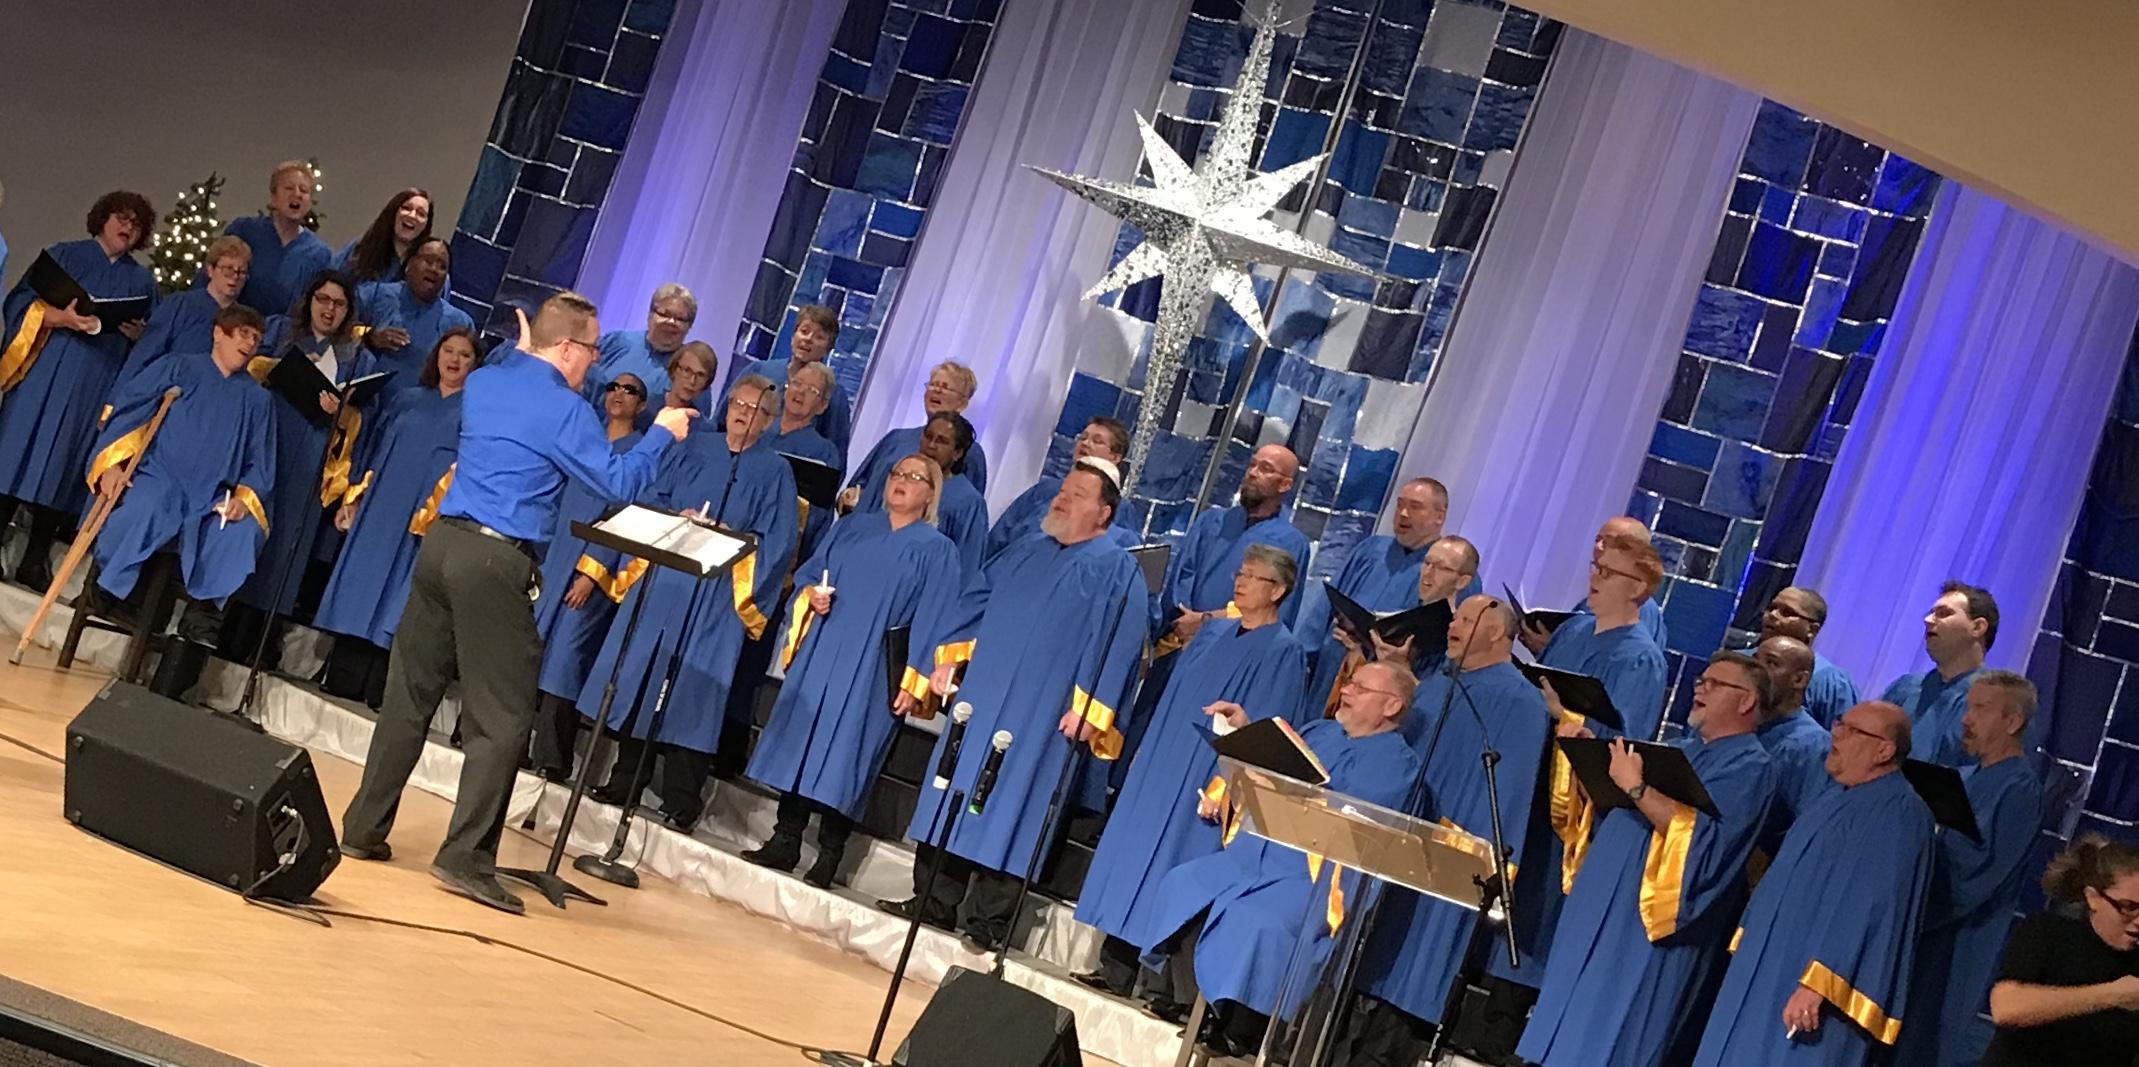 Choir at Christmas.jpg